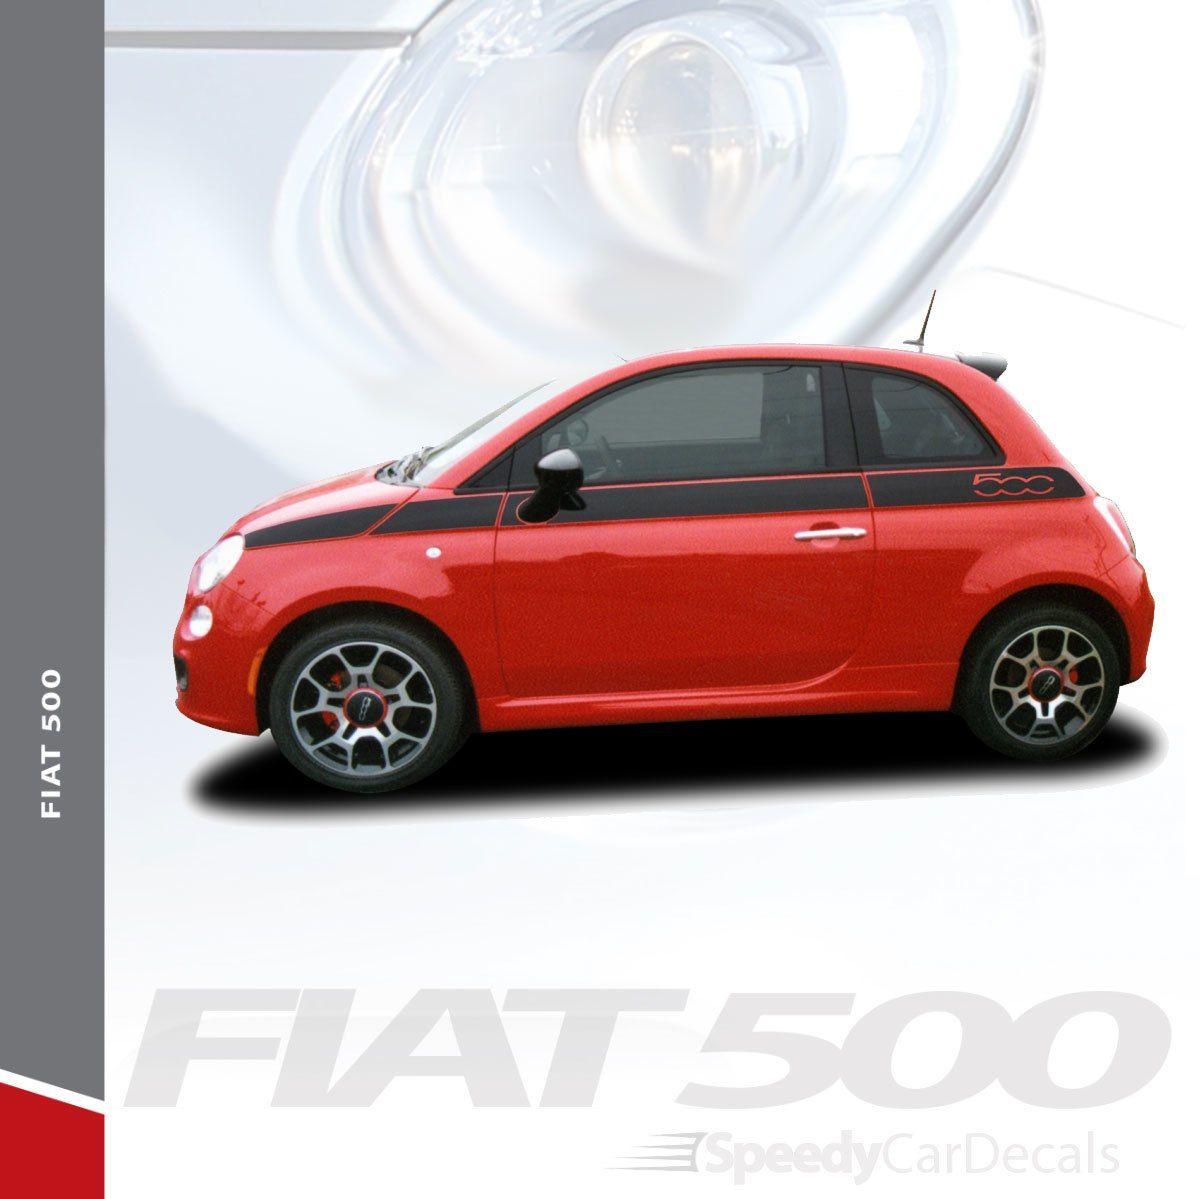 Fiat 500 Side Body Stripes 3m Fiat Se5 2012 2015 2016 2017 2018 2019 Premium Auto Striping Fiat 500 Racing Stripes Car Stripes [ 1199 x 1200 Pixel ]